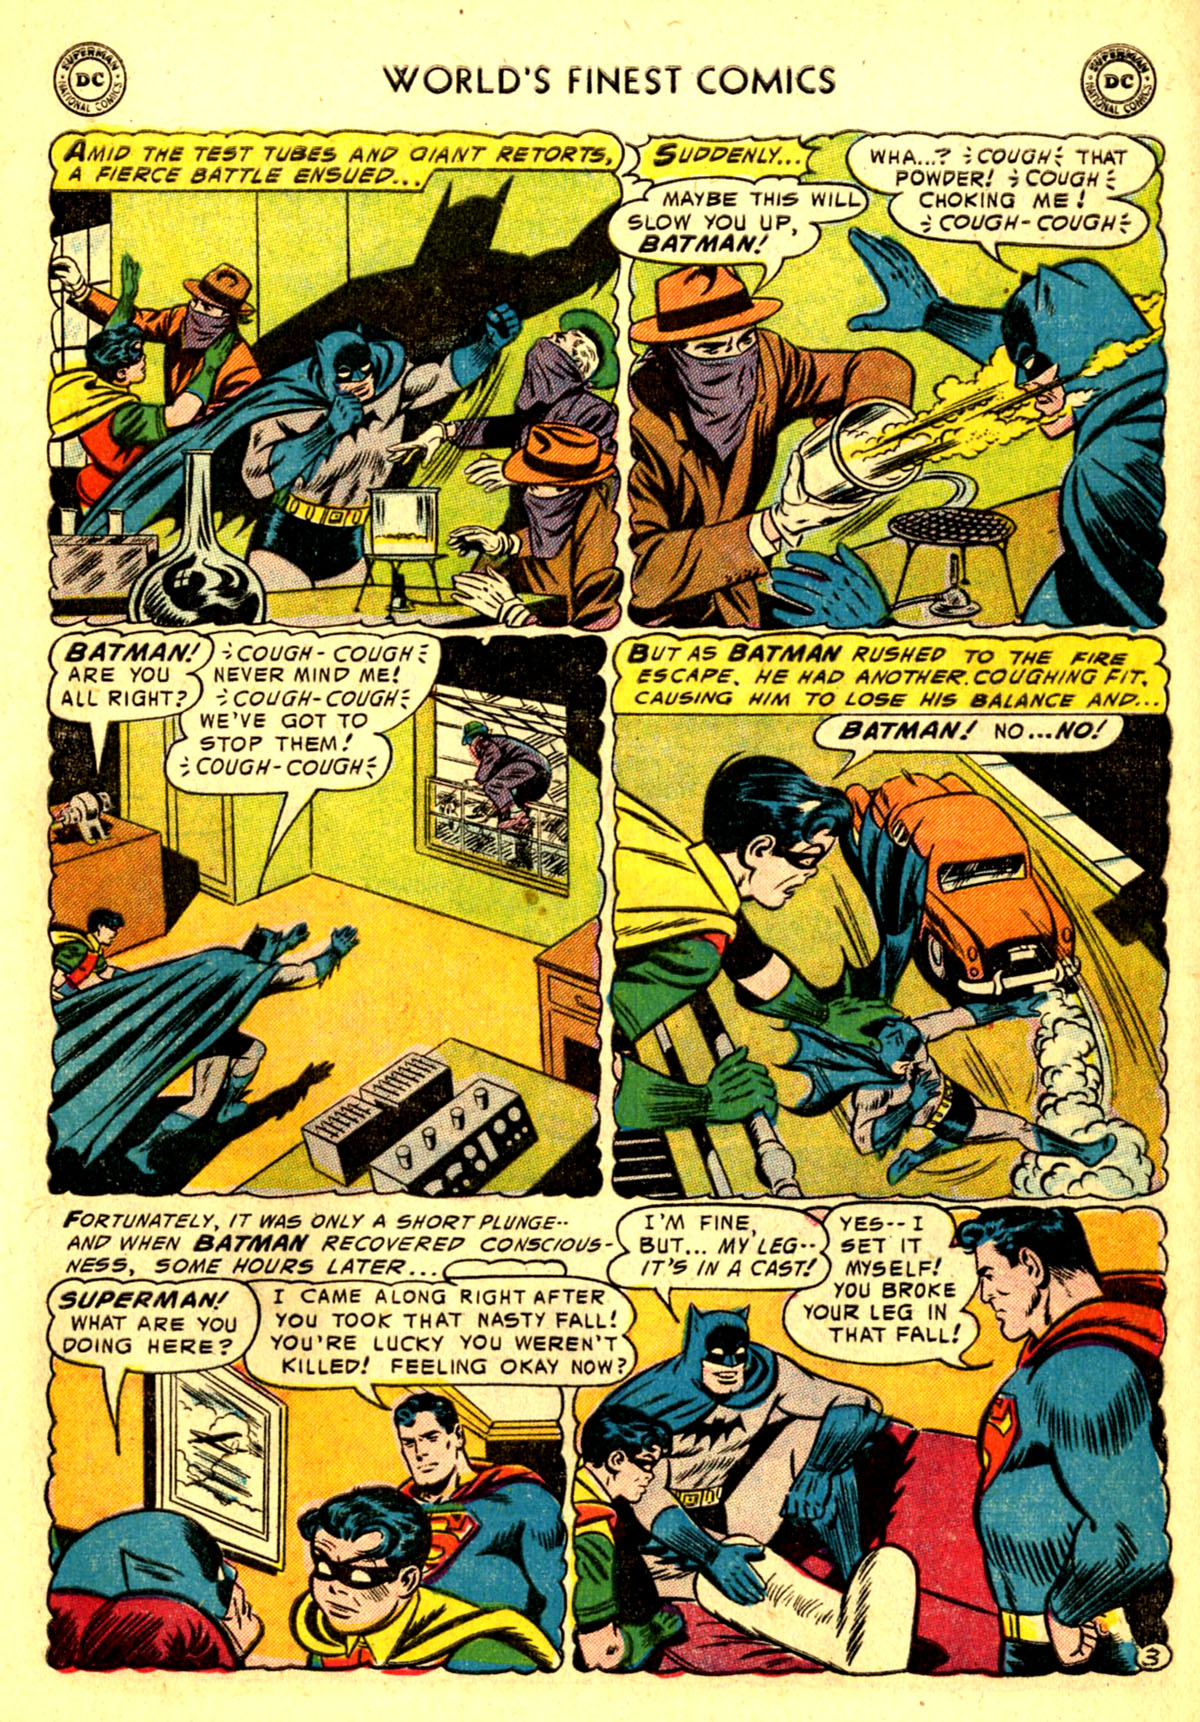 Read online World's Finest Comics comic -  Issue #75 - 5